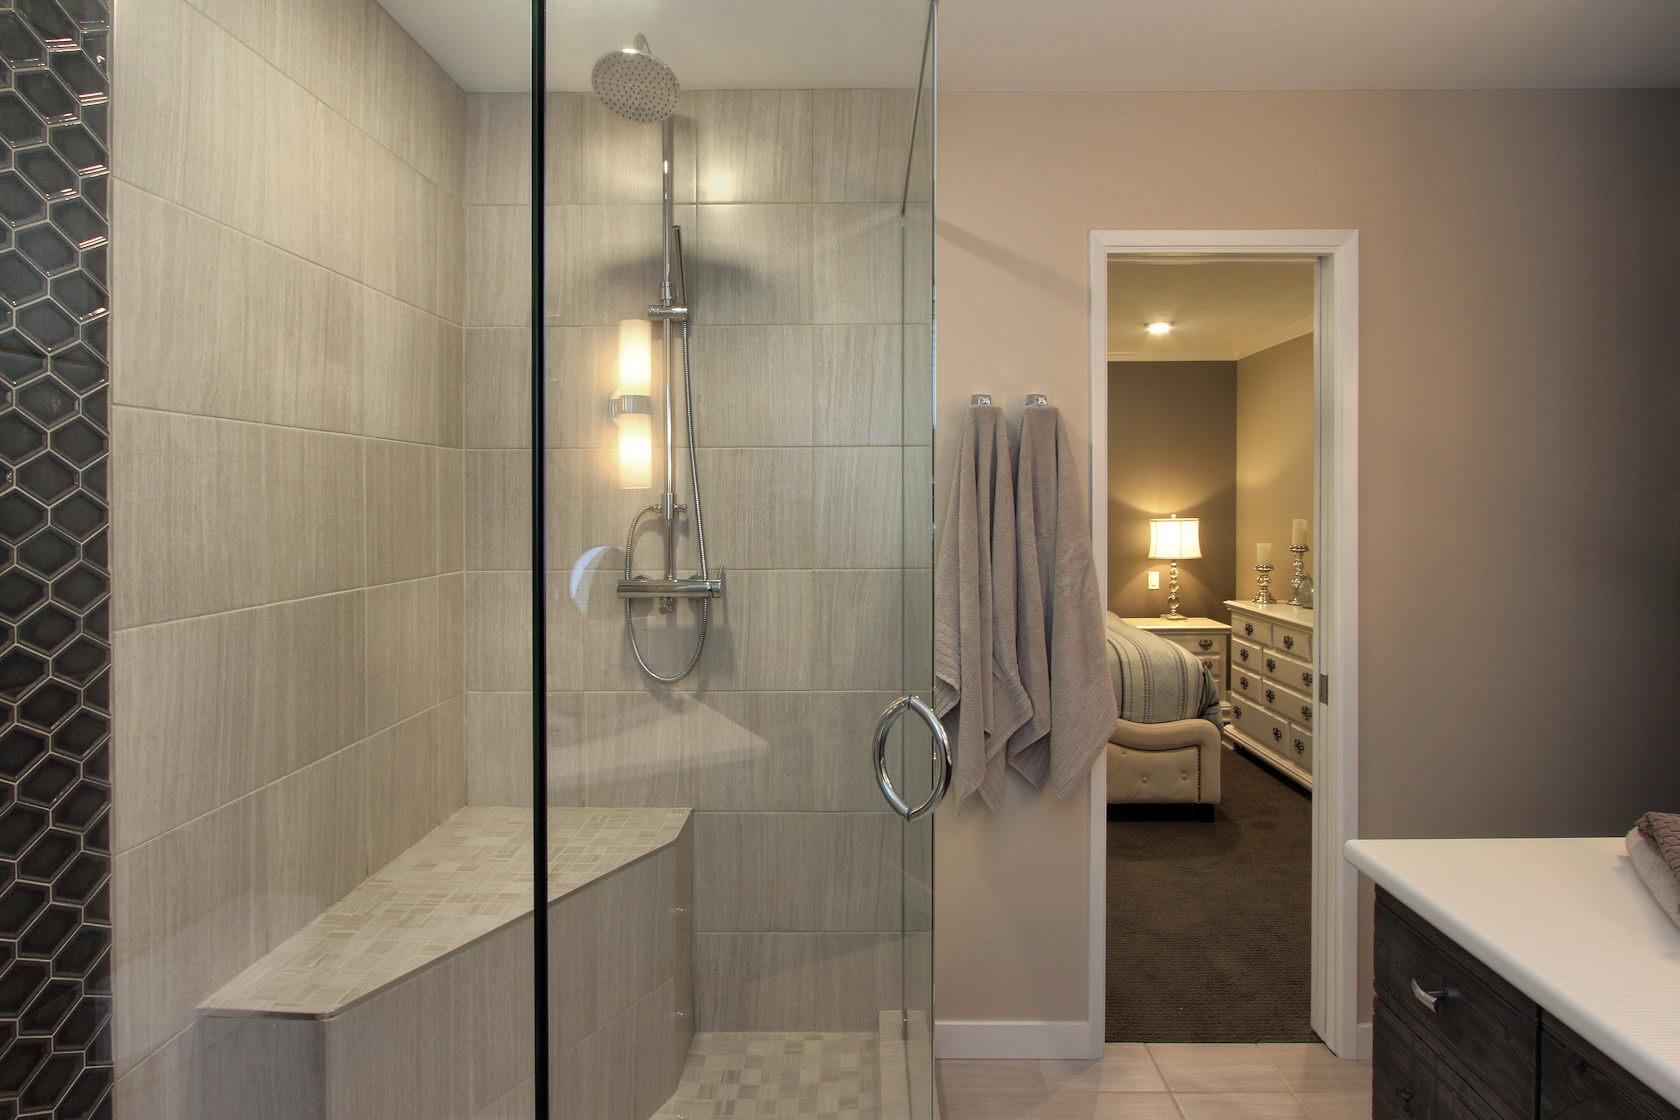 Interior Design Kelowna - Custome bathroom design by Creative Touch Interiors